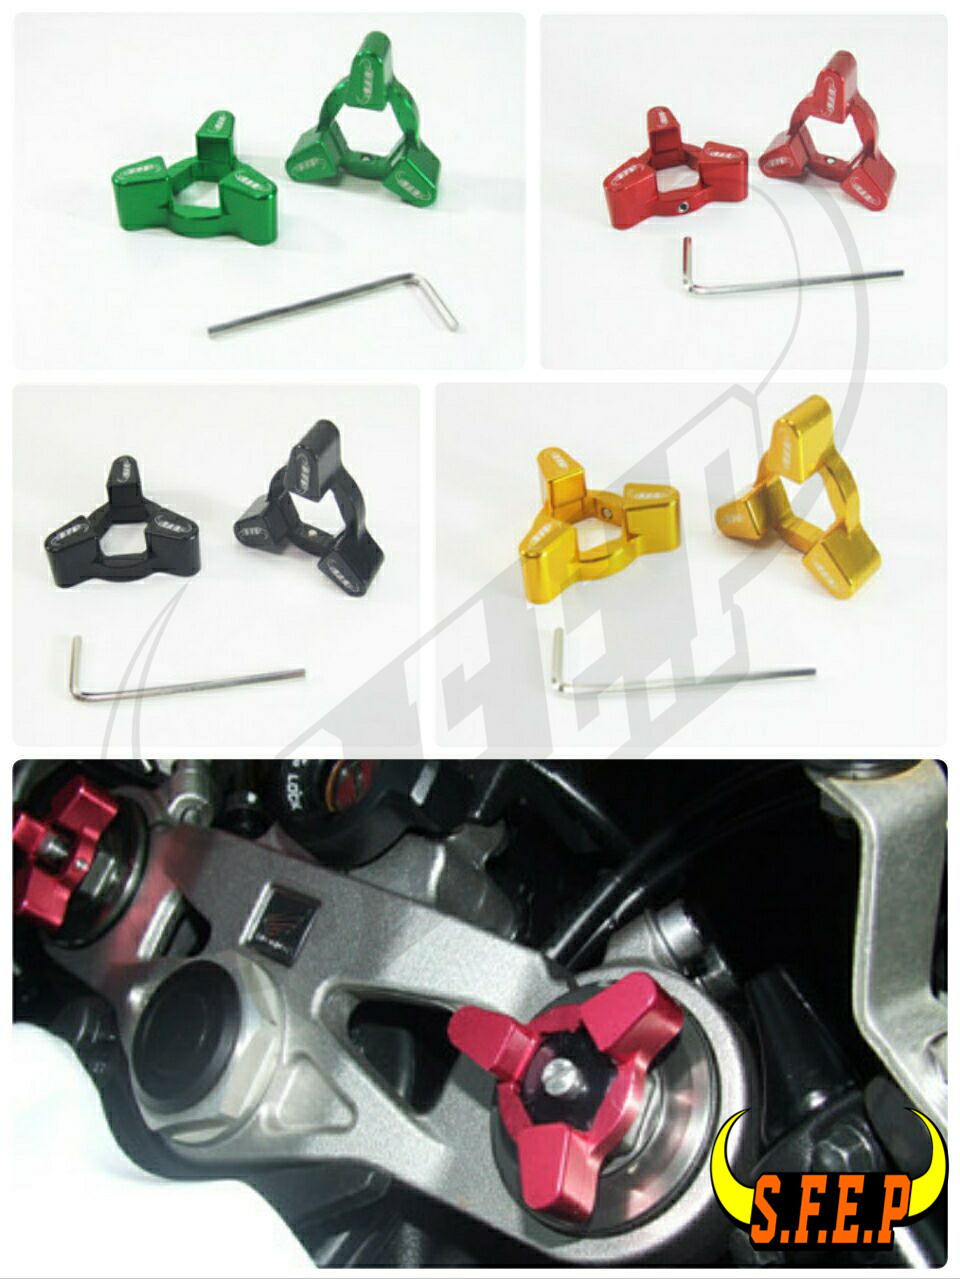 Motorcycle CNC Fork Preload Adjusters For Honda CBR 600 F2,F3,F4, F4i 87-07/ CBR 900RR 93-99/ CBR 600RR 03-04/ VTR1000F 98-05